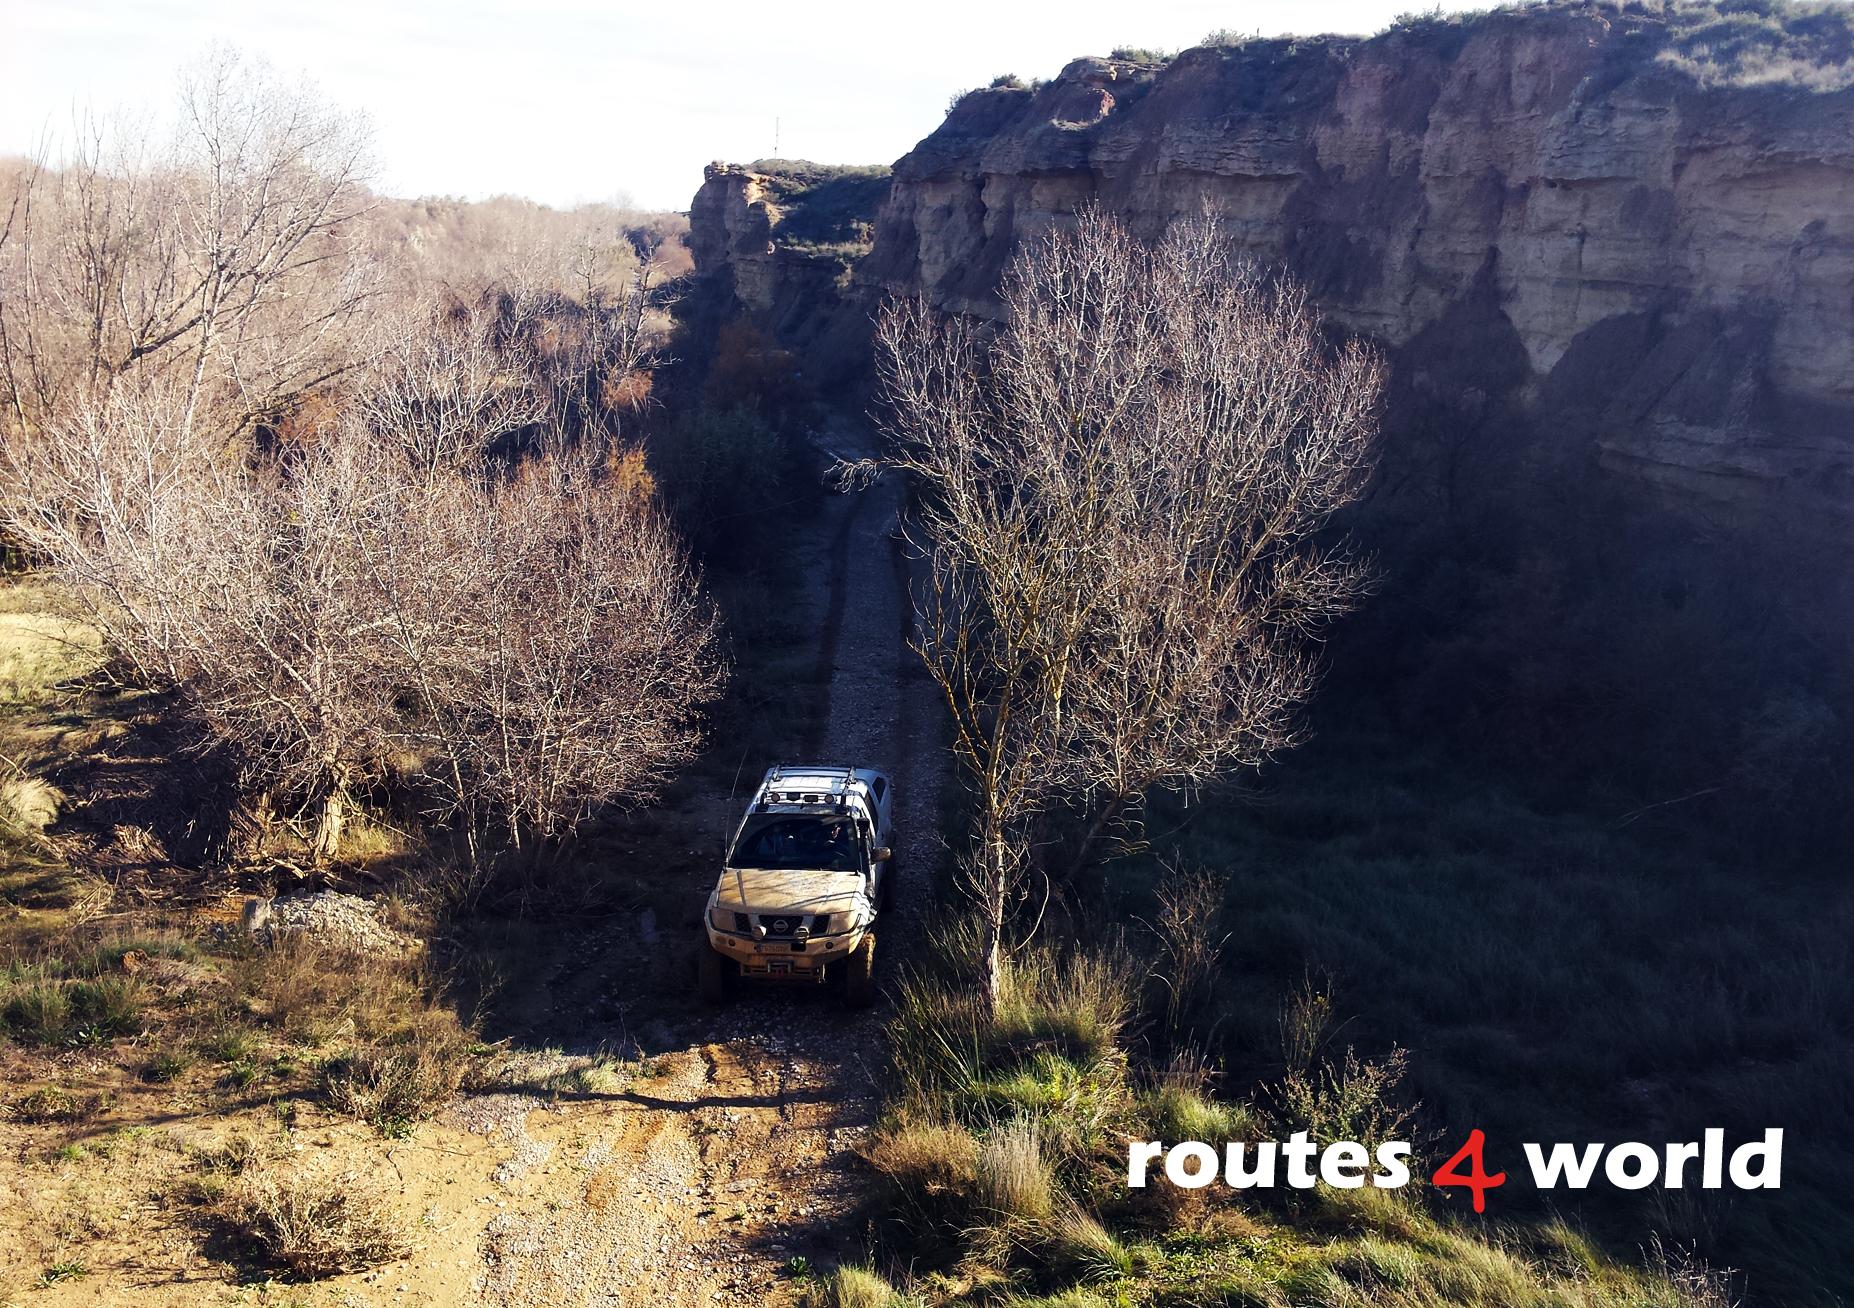 Monegros R4W - routes4world (83)